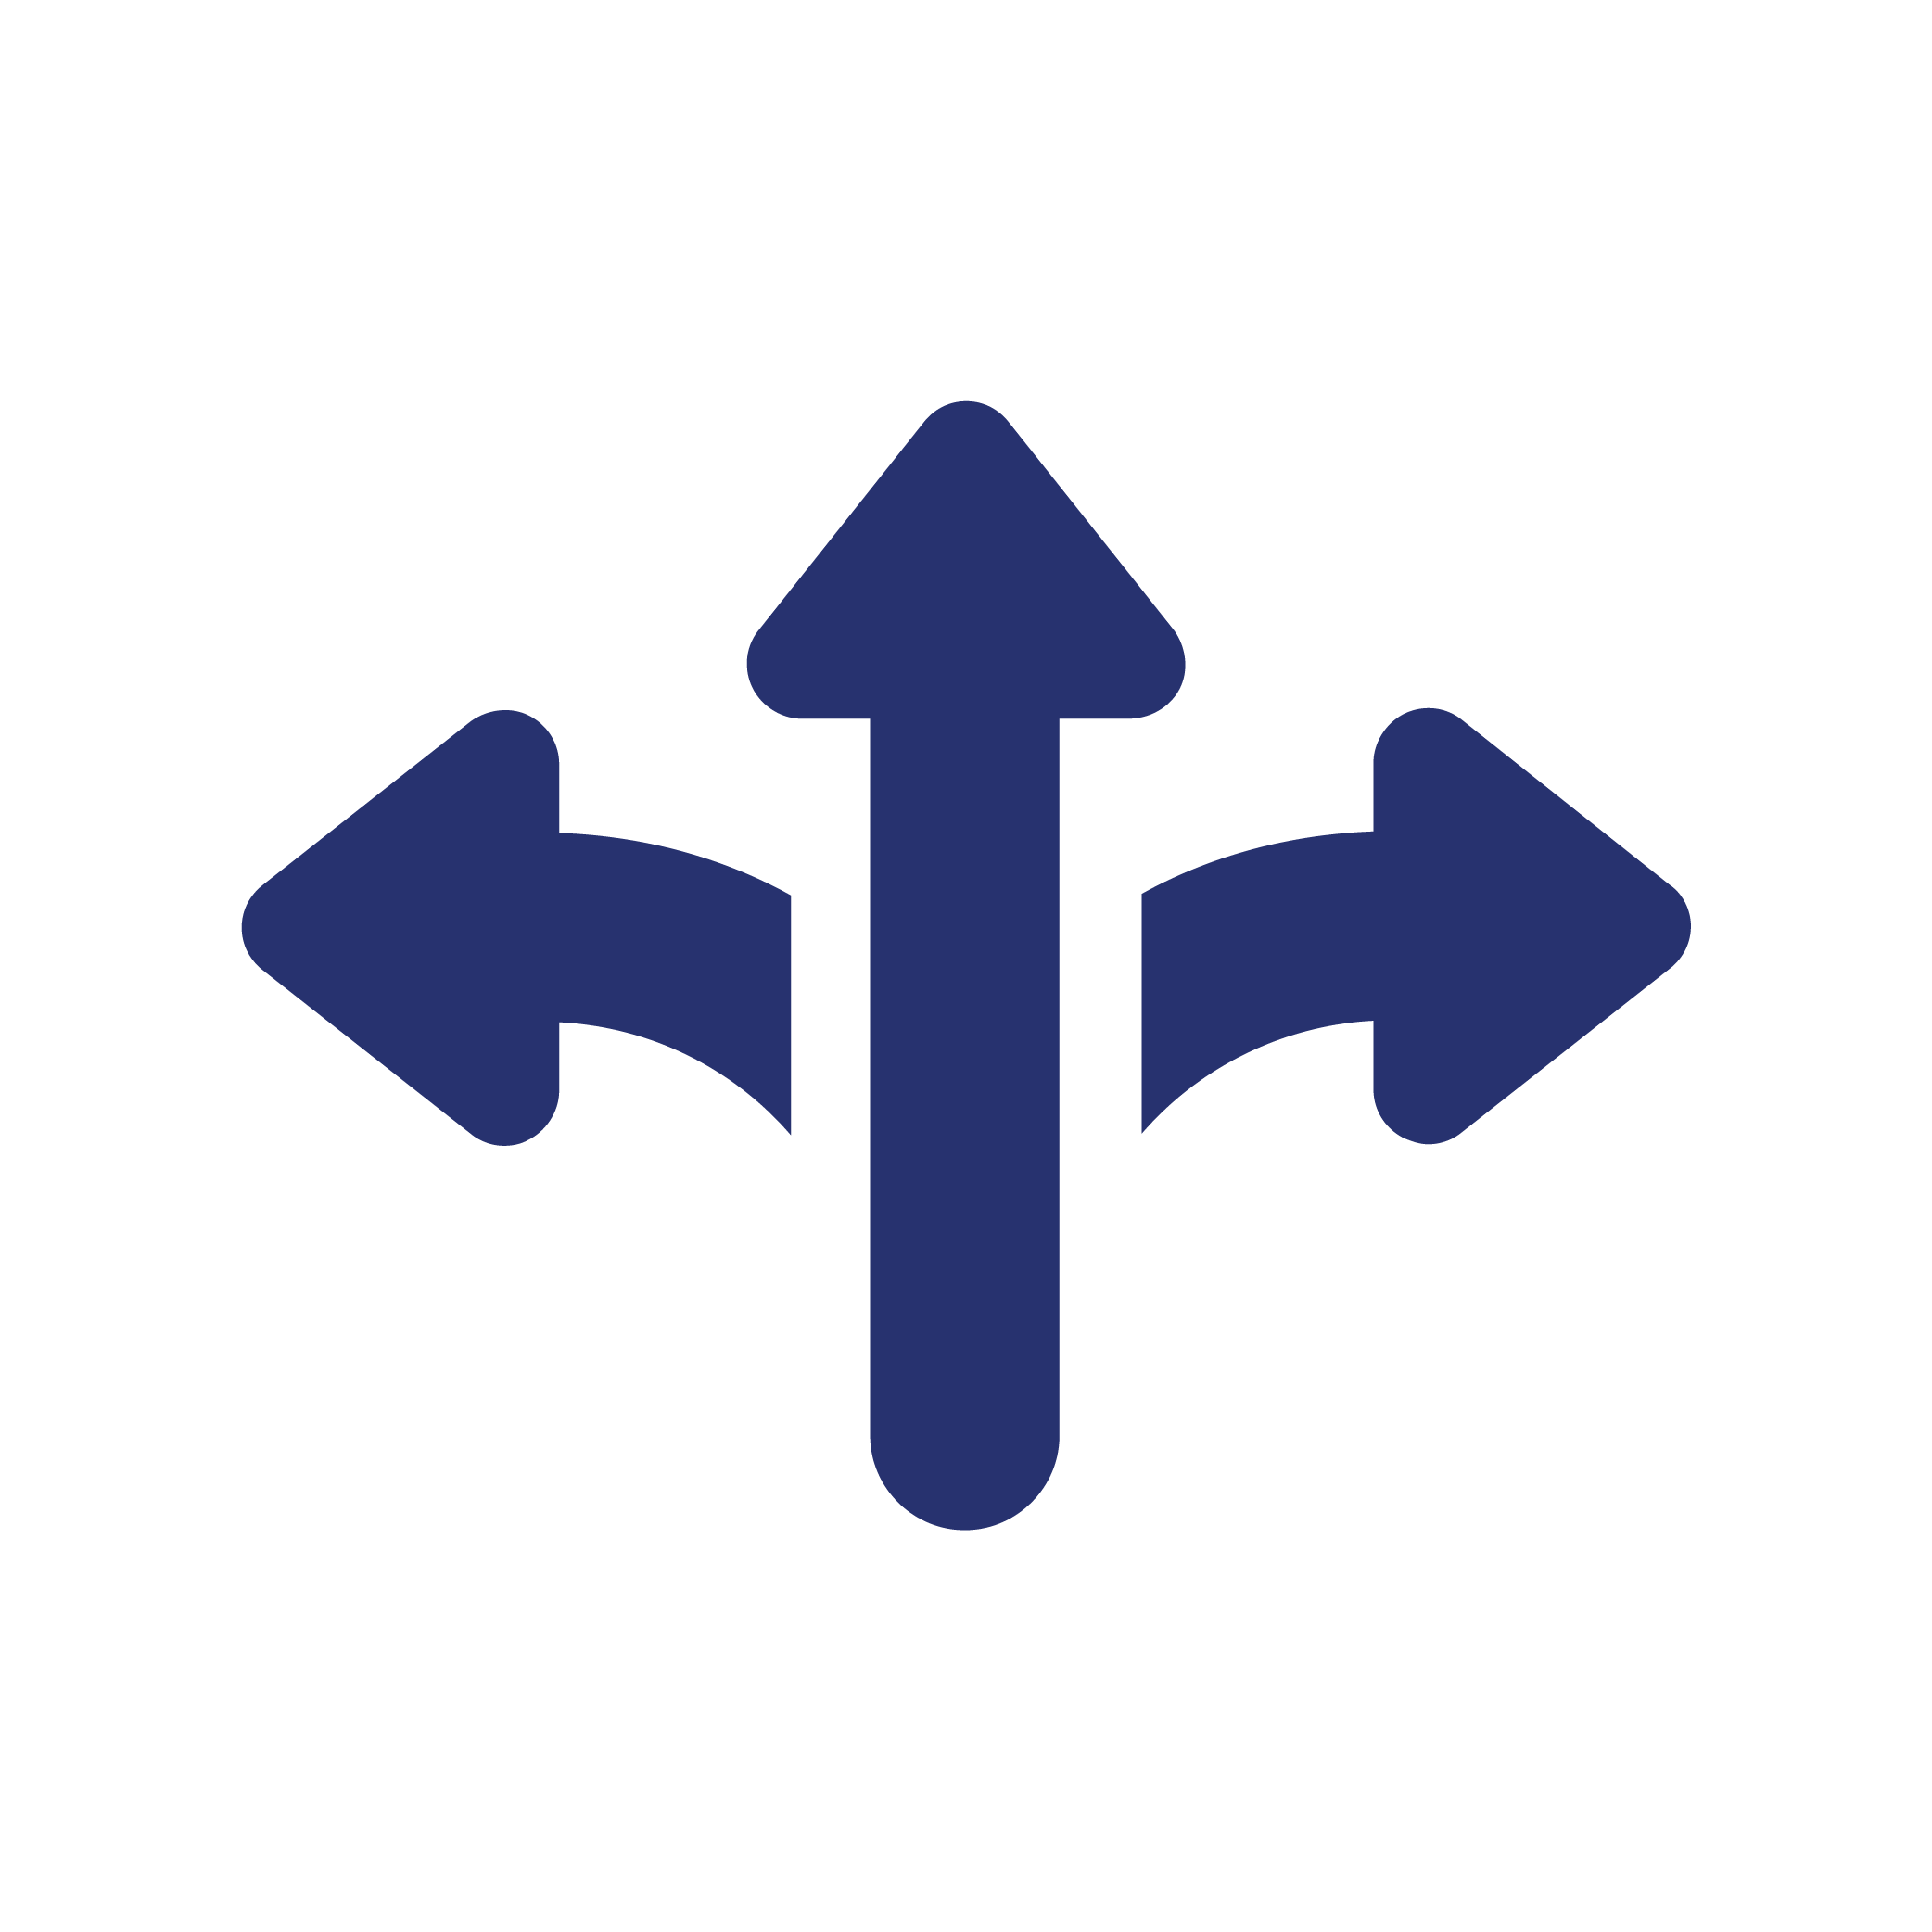 MHSP - location  icon